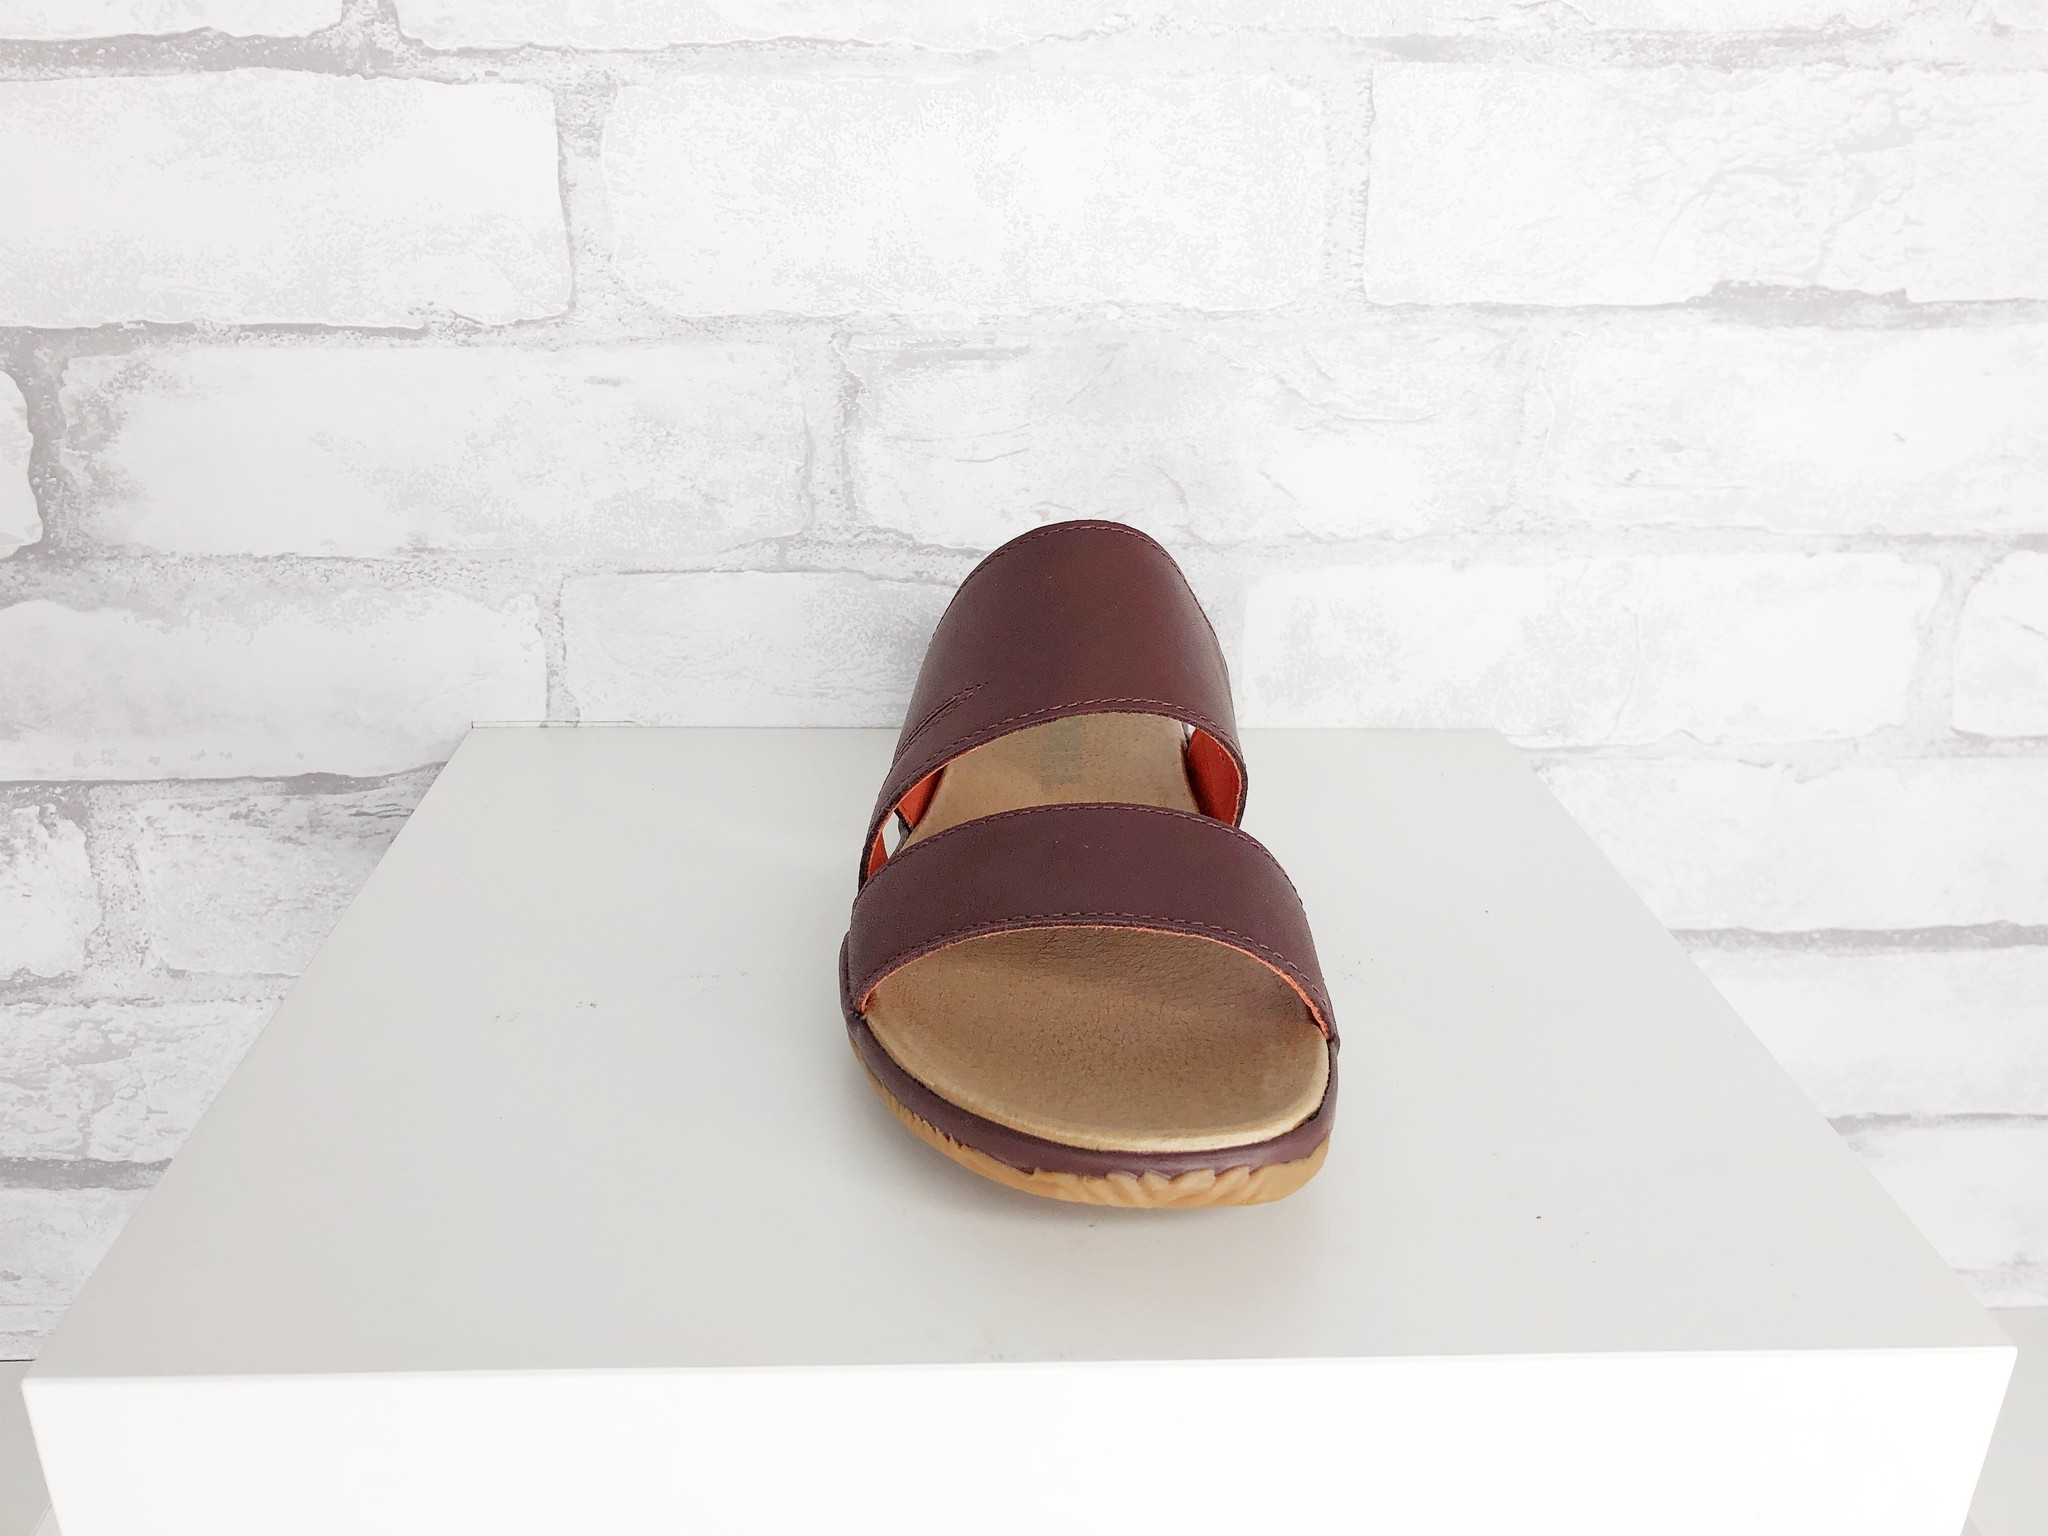 Sorel Footwear Out N About Plus Slide Elderberry